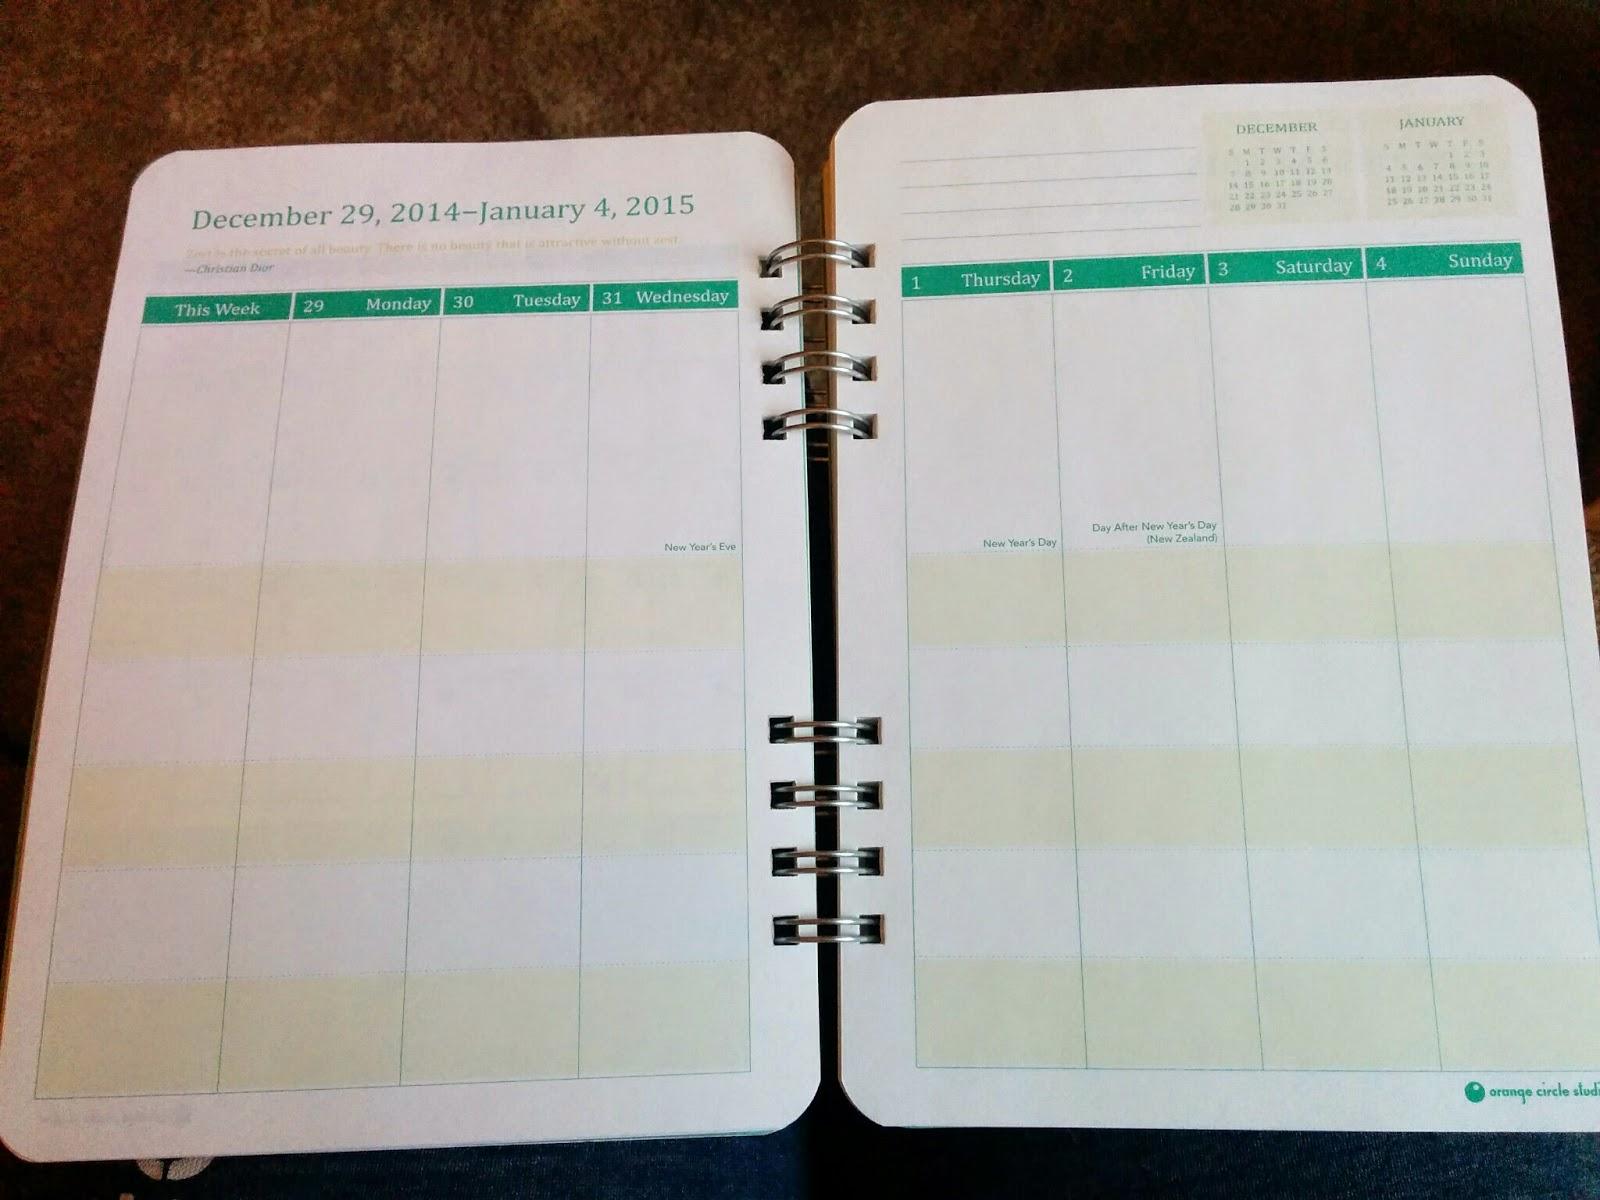 2015 planning calendar